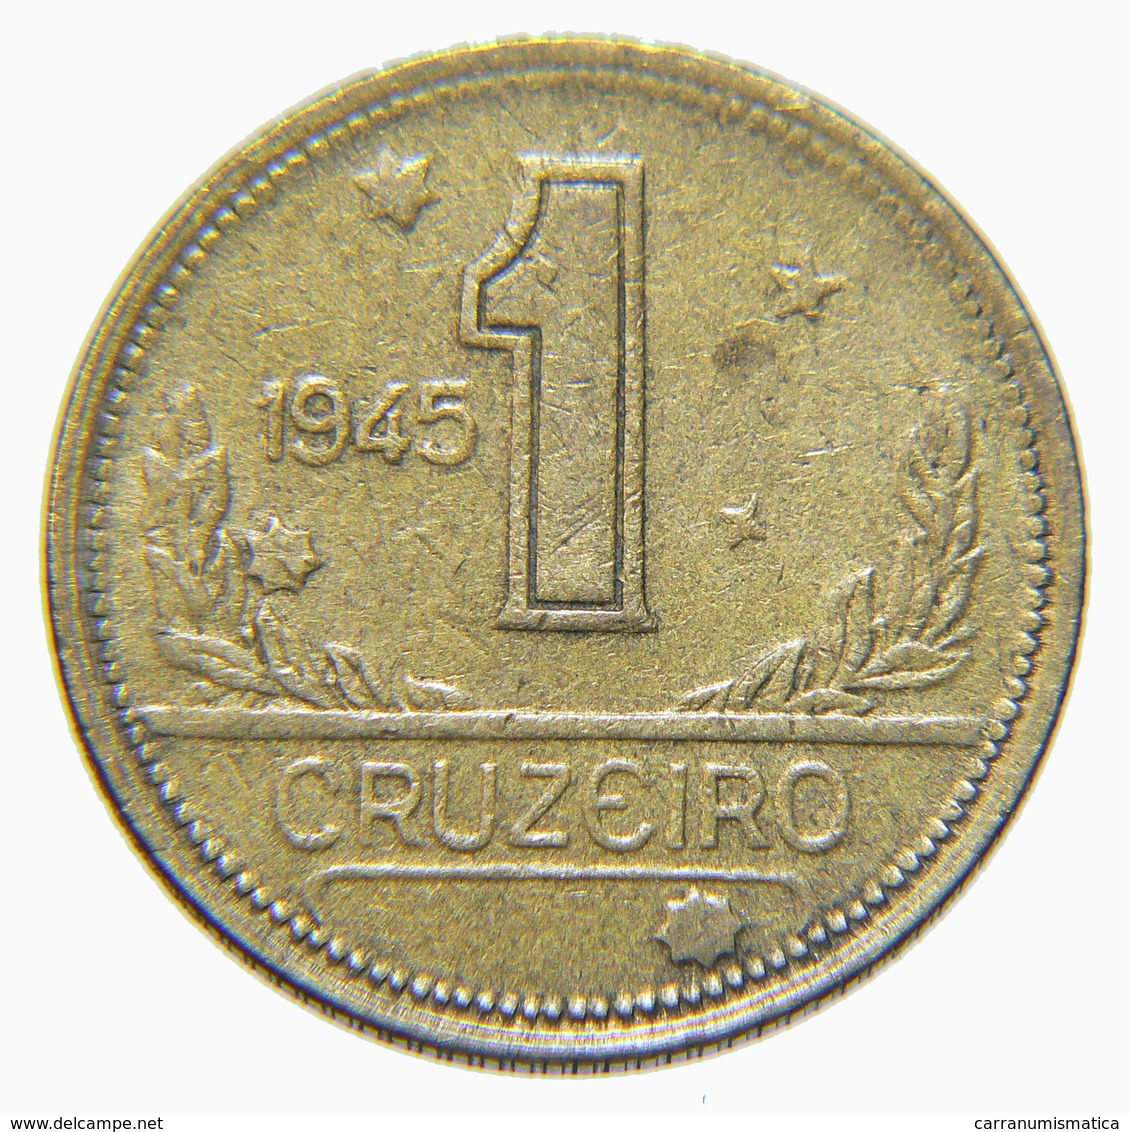 [NC] BRASILE - 1 CRUZEIRO - 1945 (nc3996) - Brésil